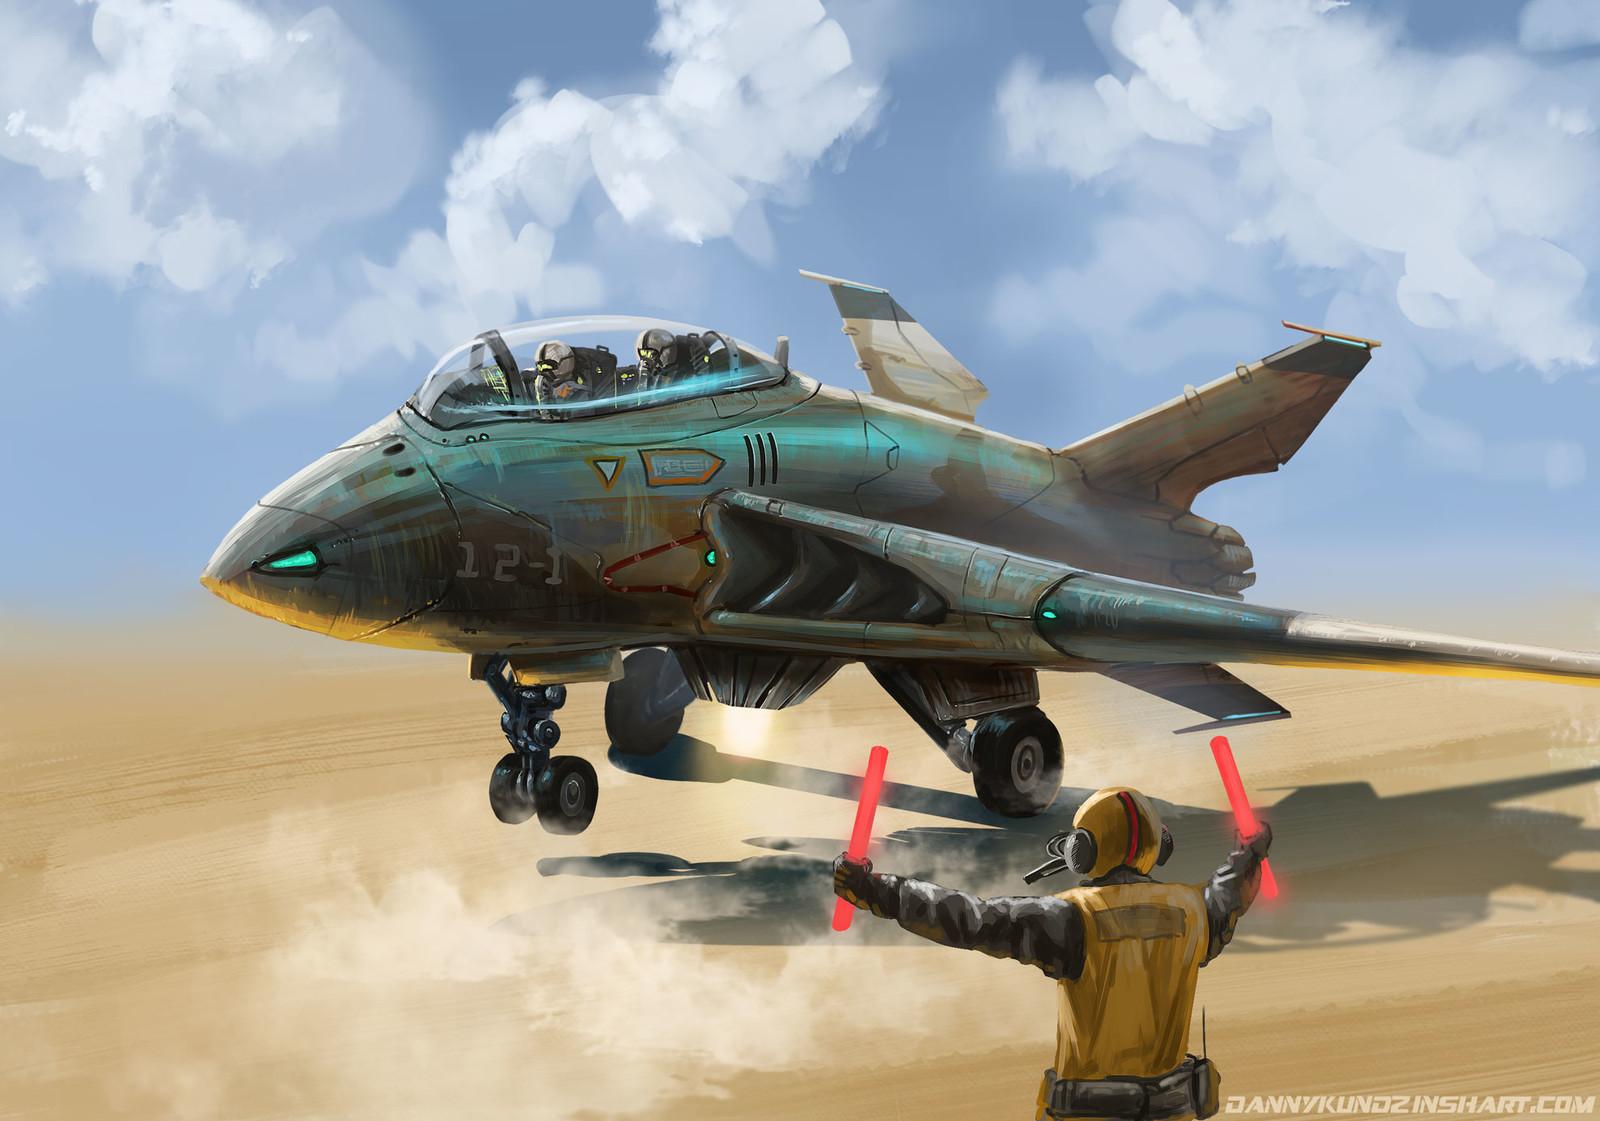 Steady landing